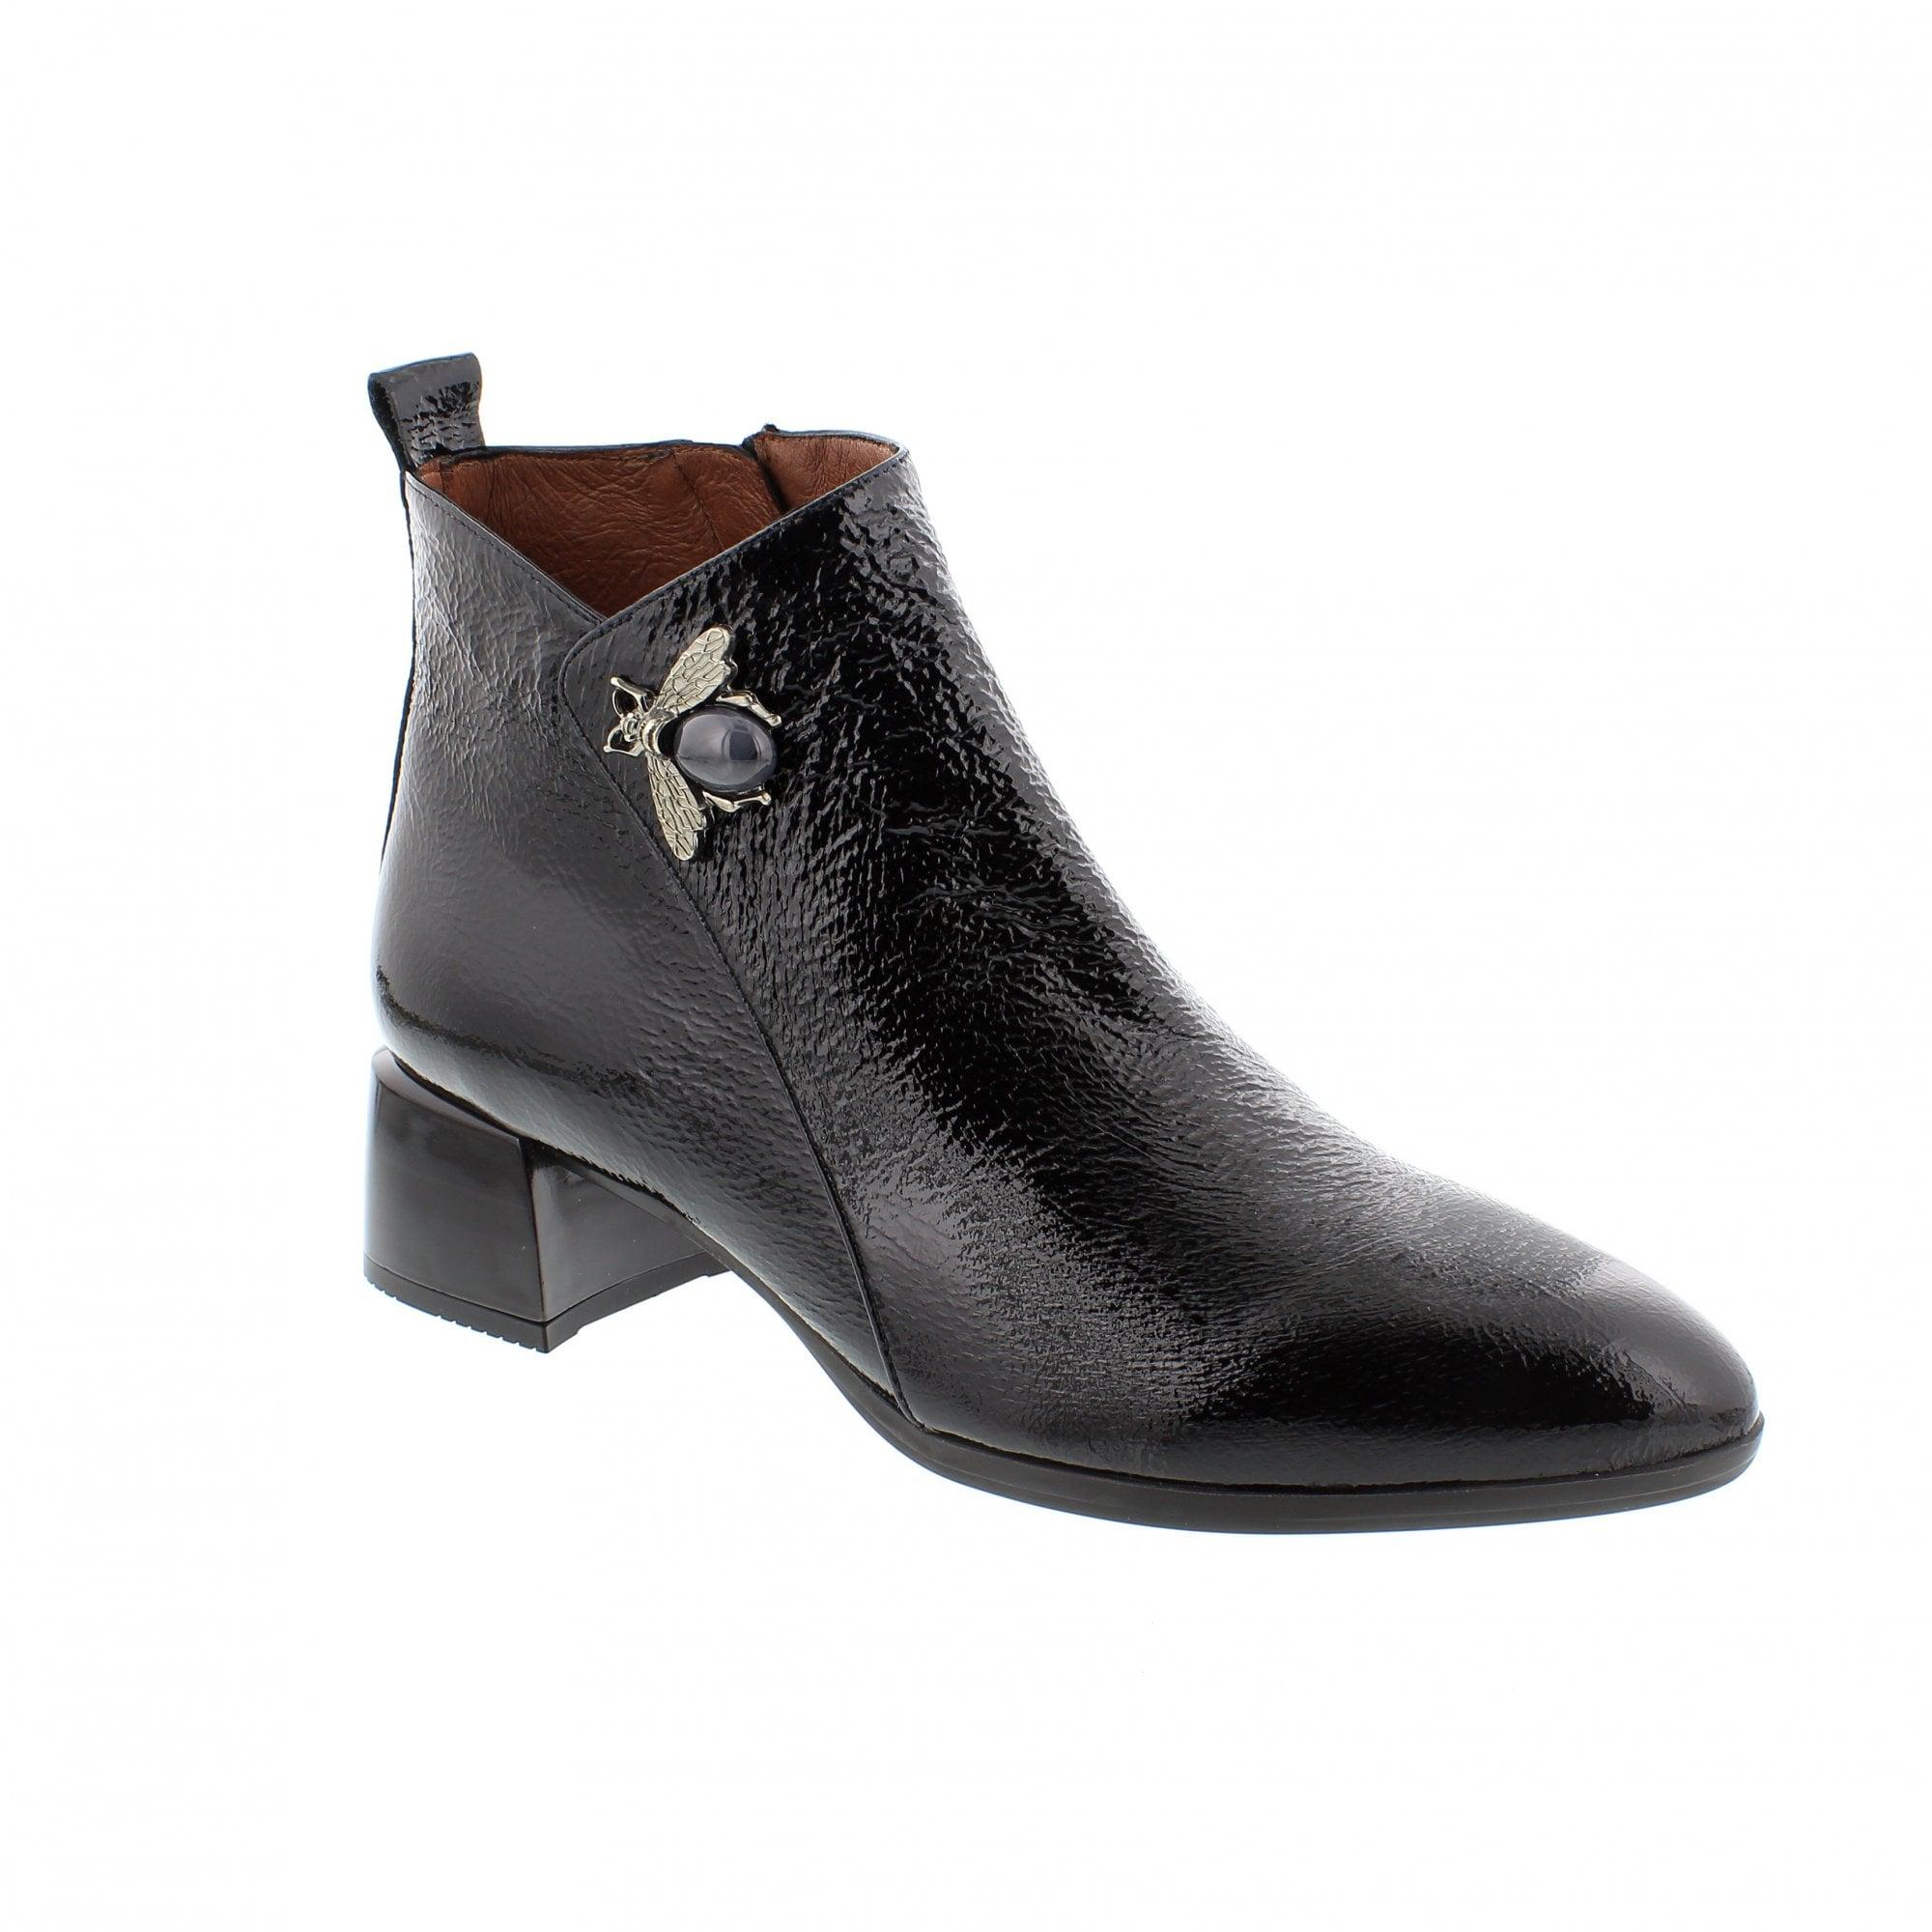 5952128147e99 Hispanitas Ginger 87414-v10 Womens Ankle Boots | Rogerson Shoes